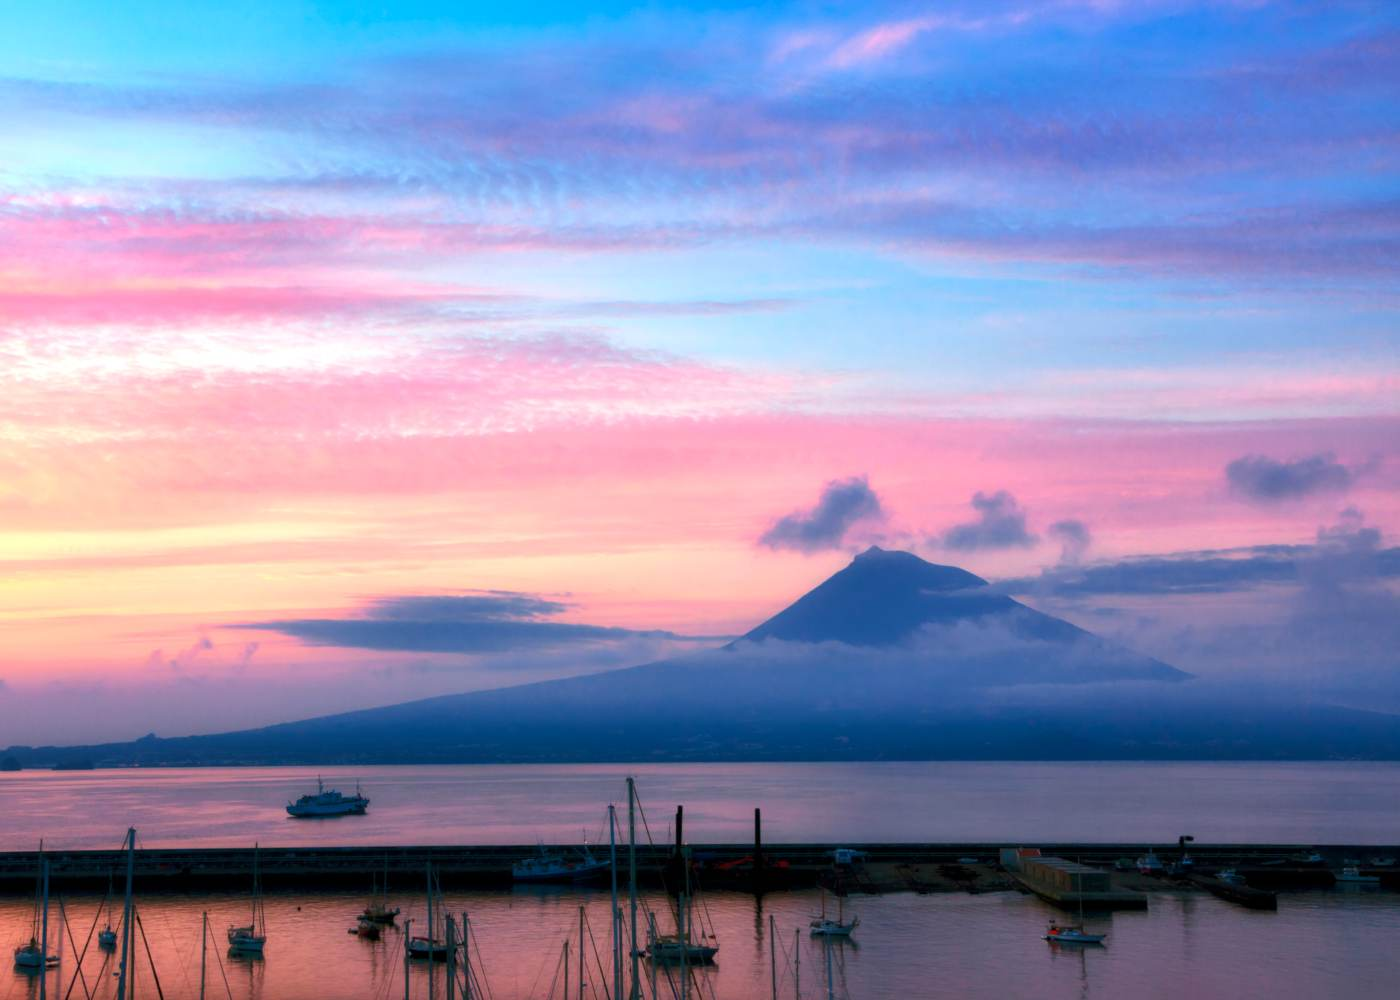 Ilha do Pico vista do Faial